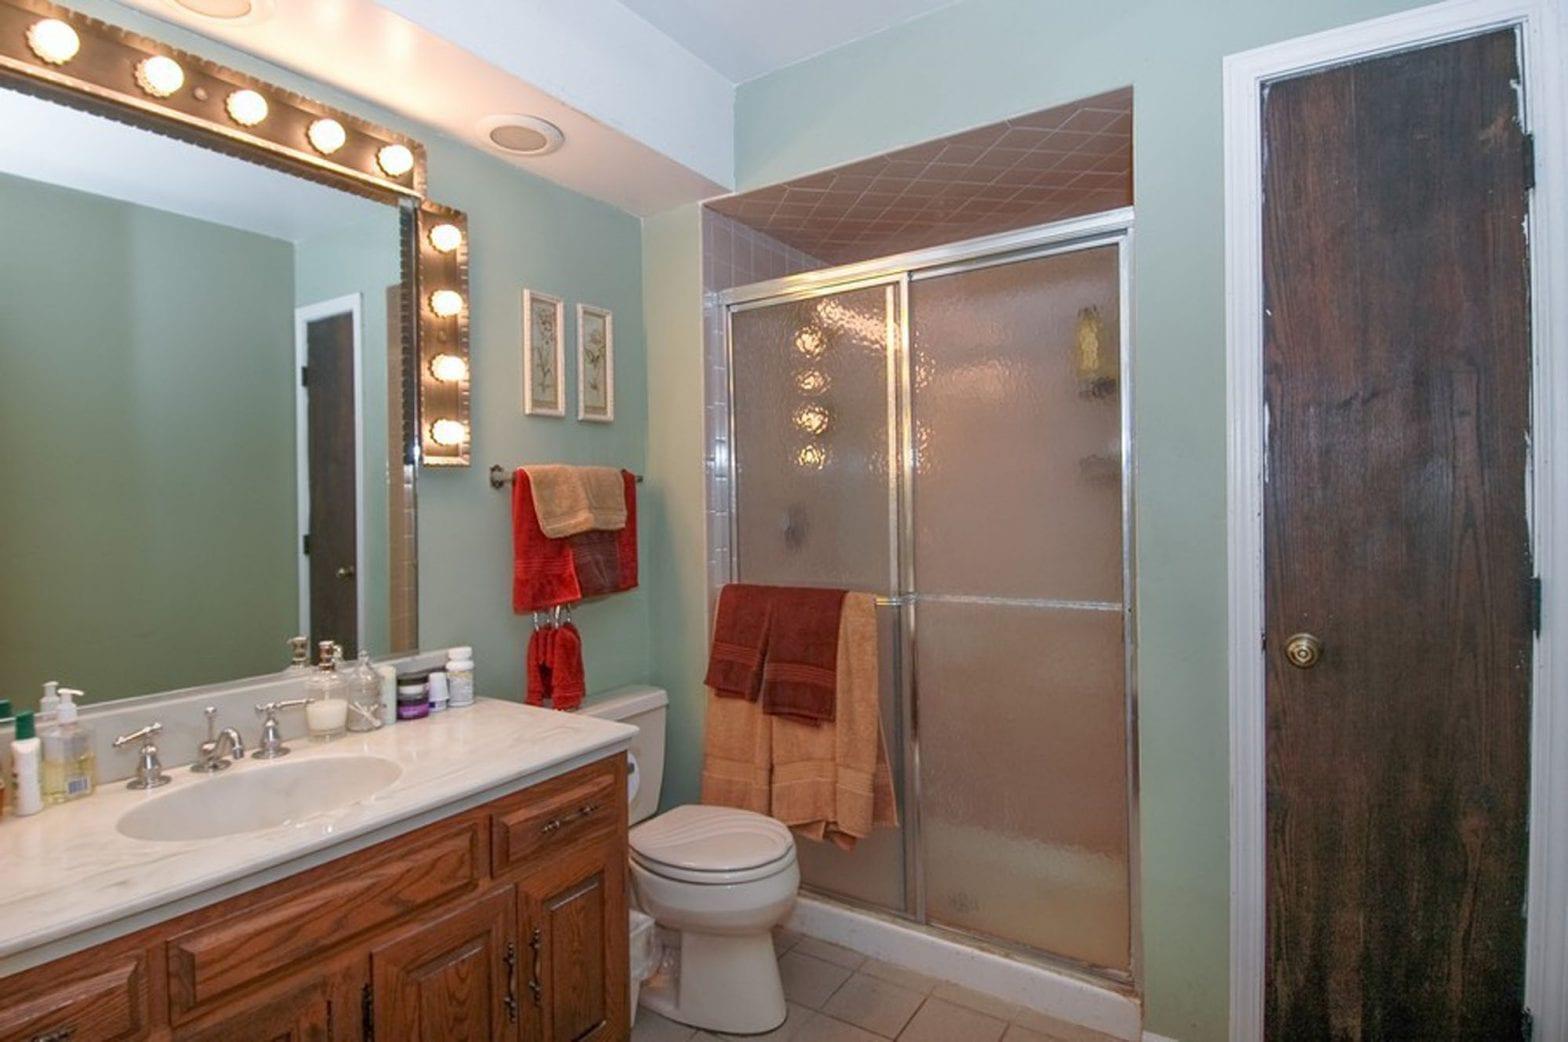 Bathroom remodeling in East Dundee